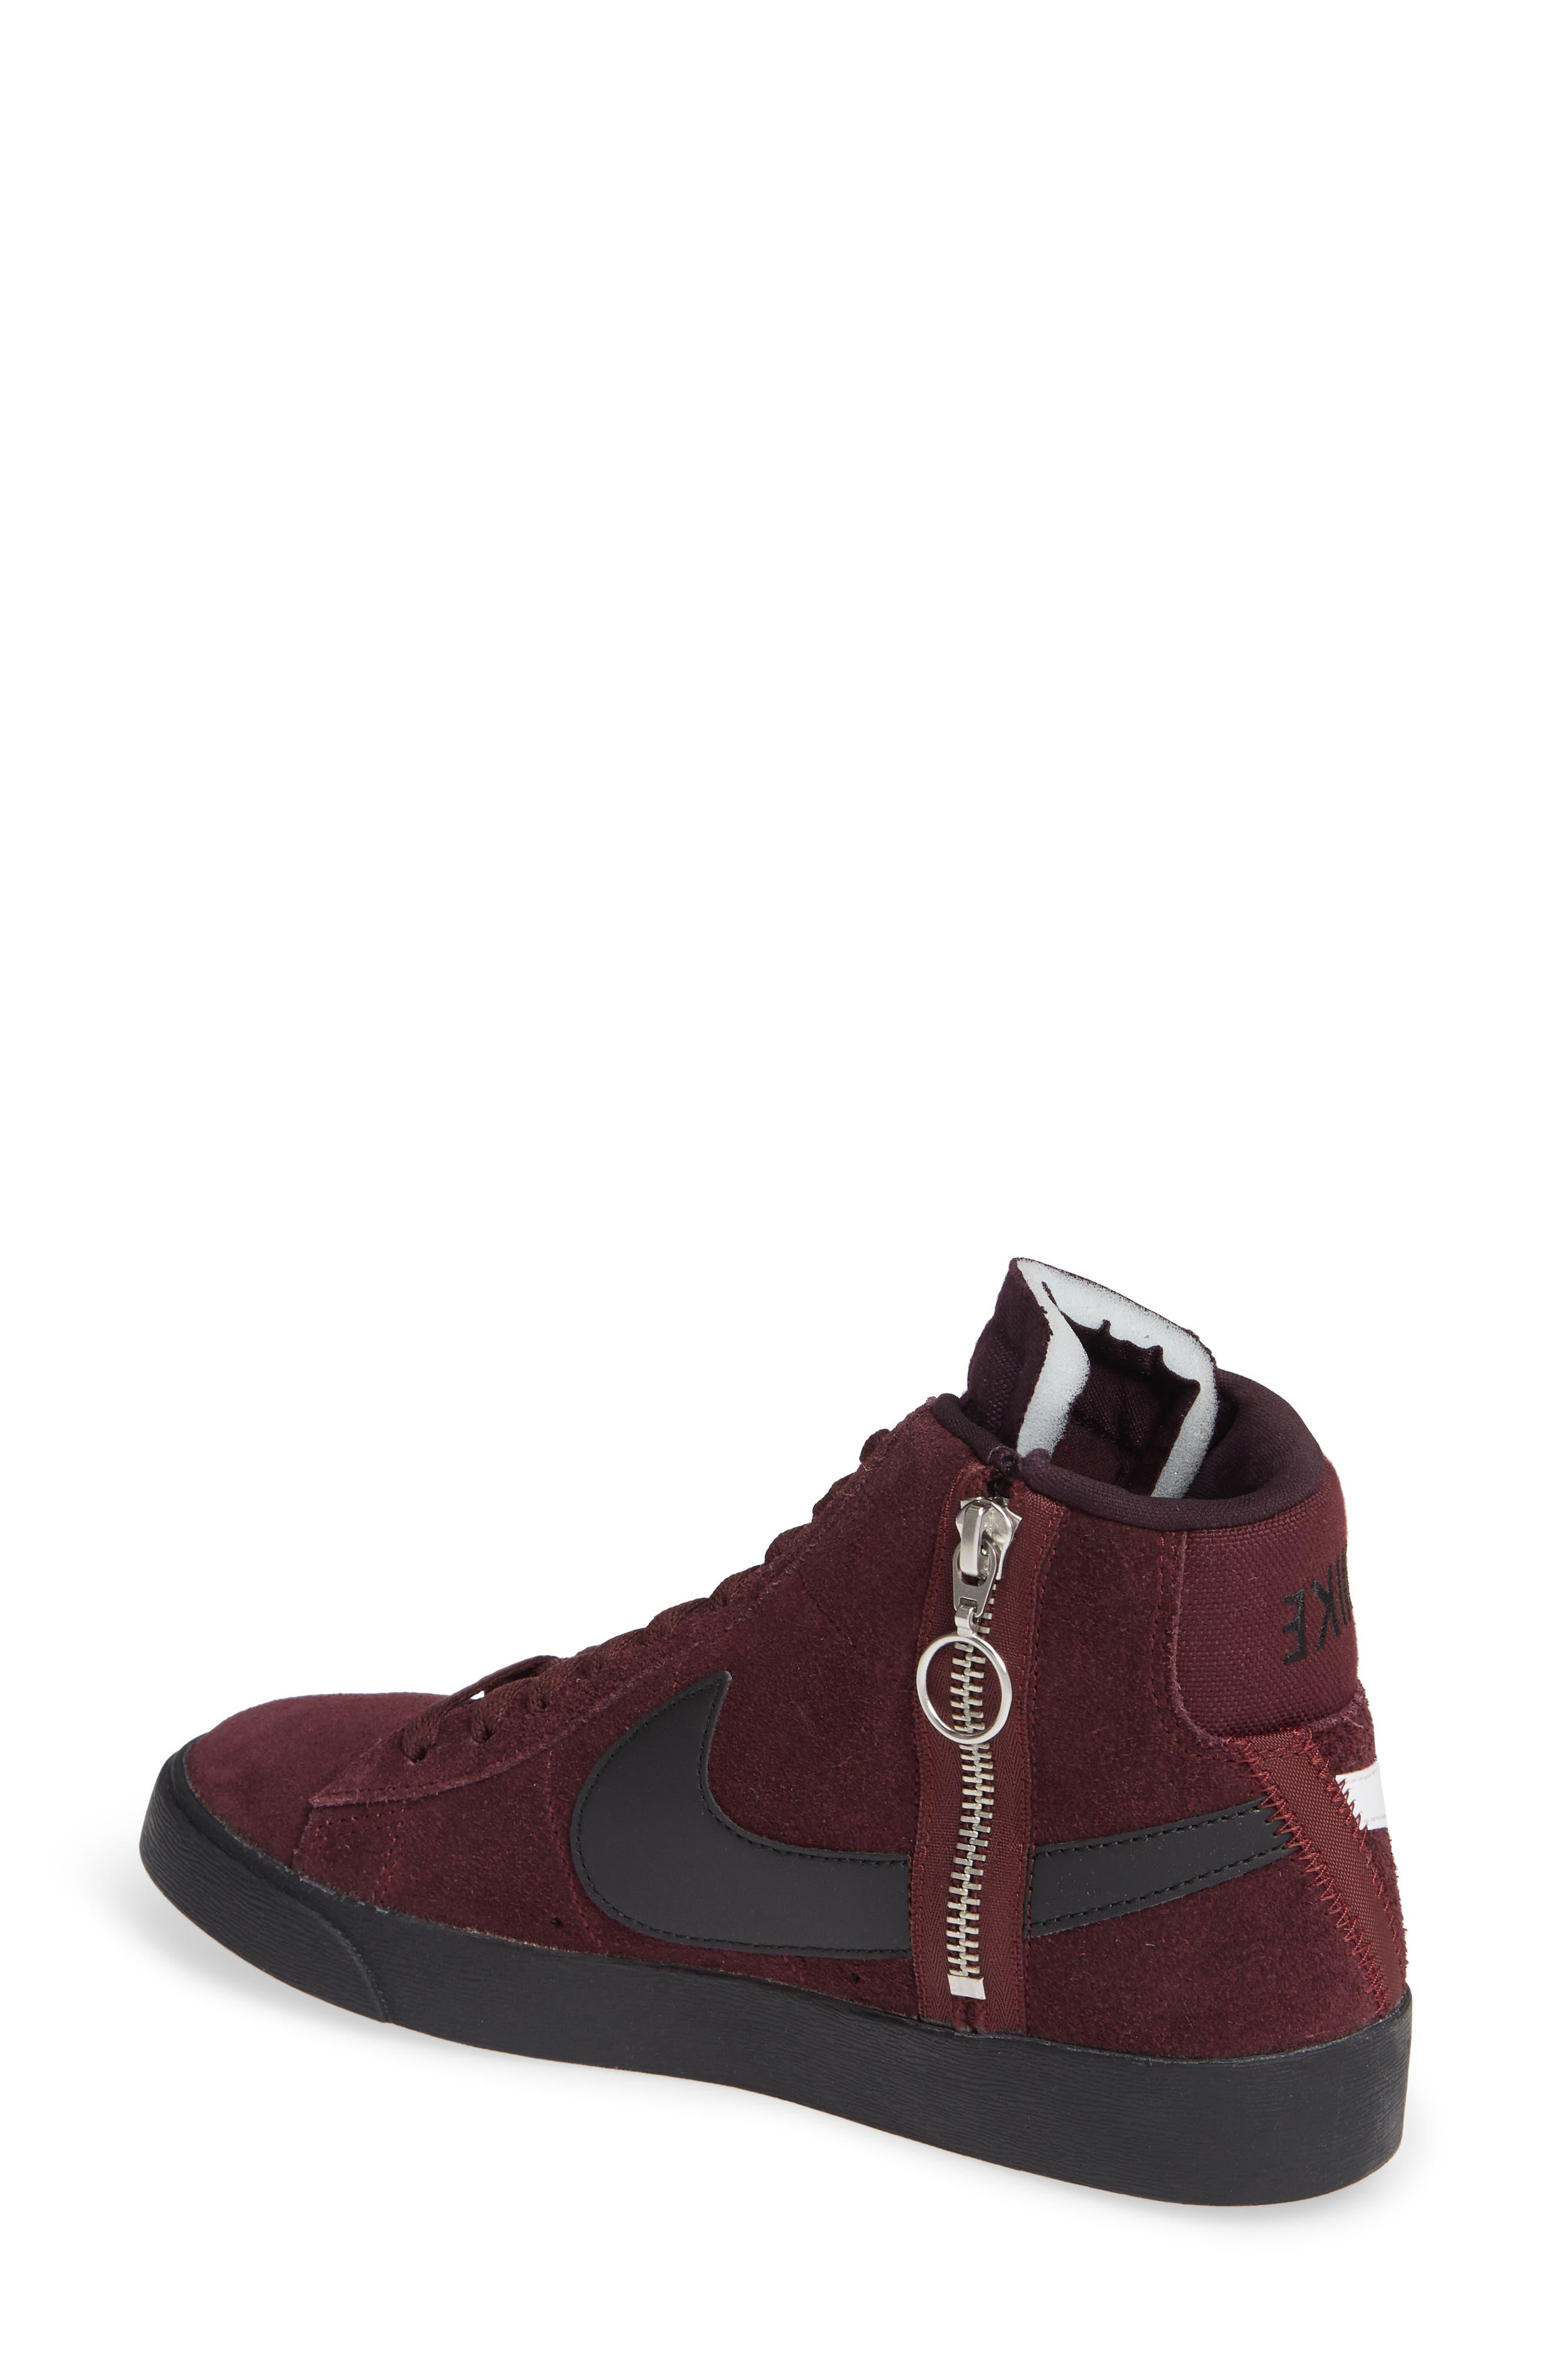 NIKE, Blazer Mid Rebel Sneaker, Alternate thumbnail 2, color, 930